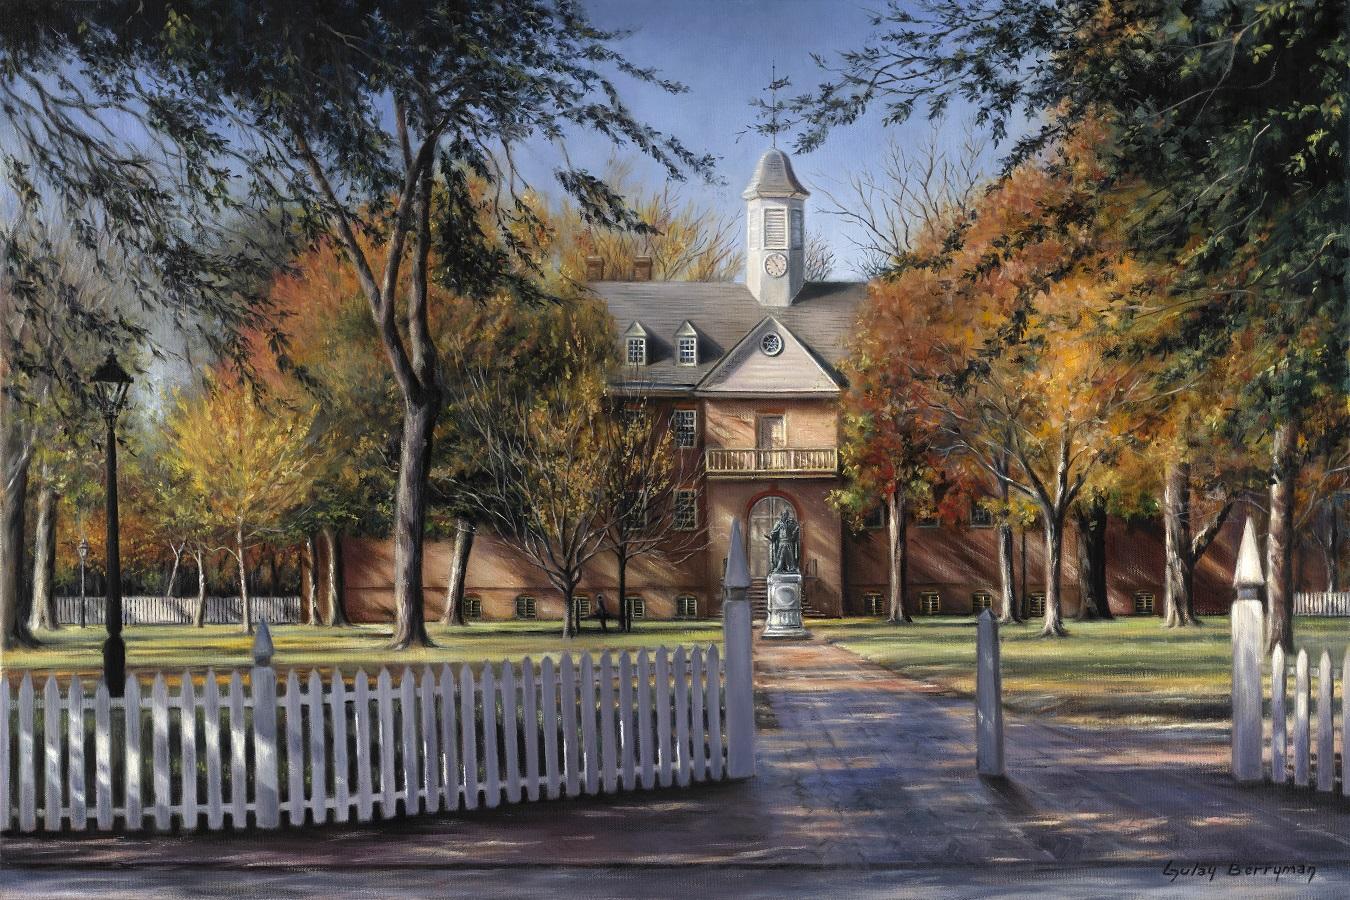 The Wren Building, College of William & Mary